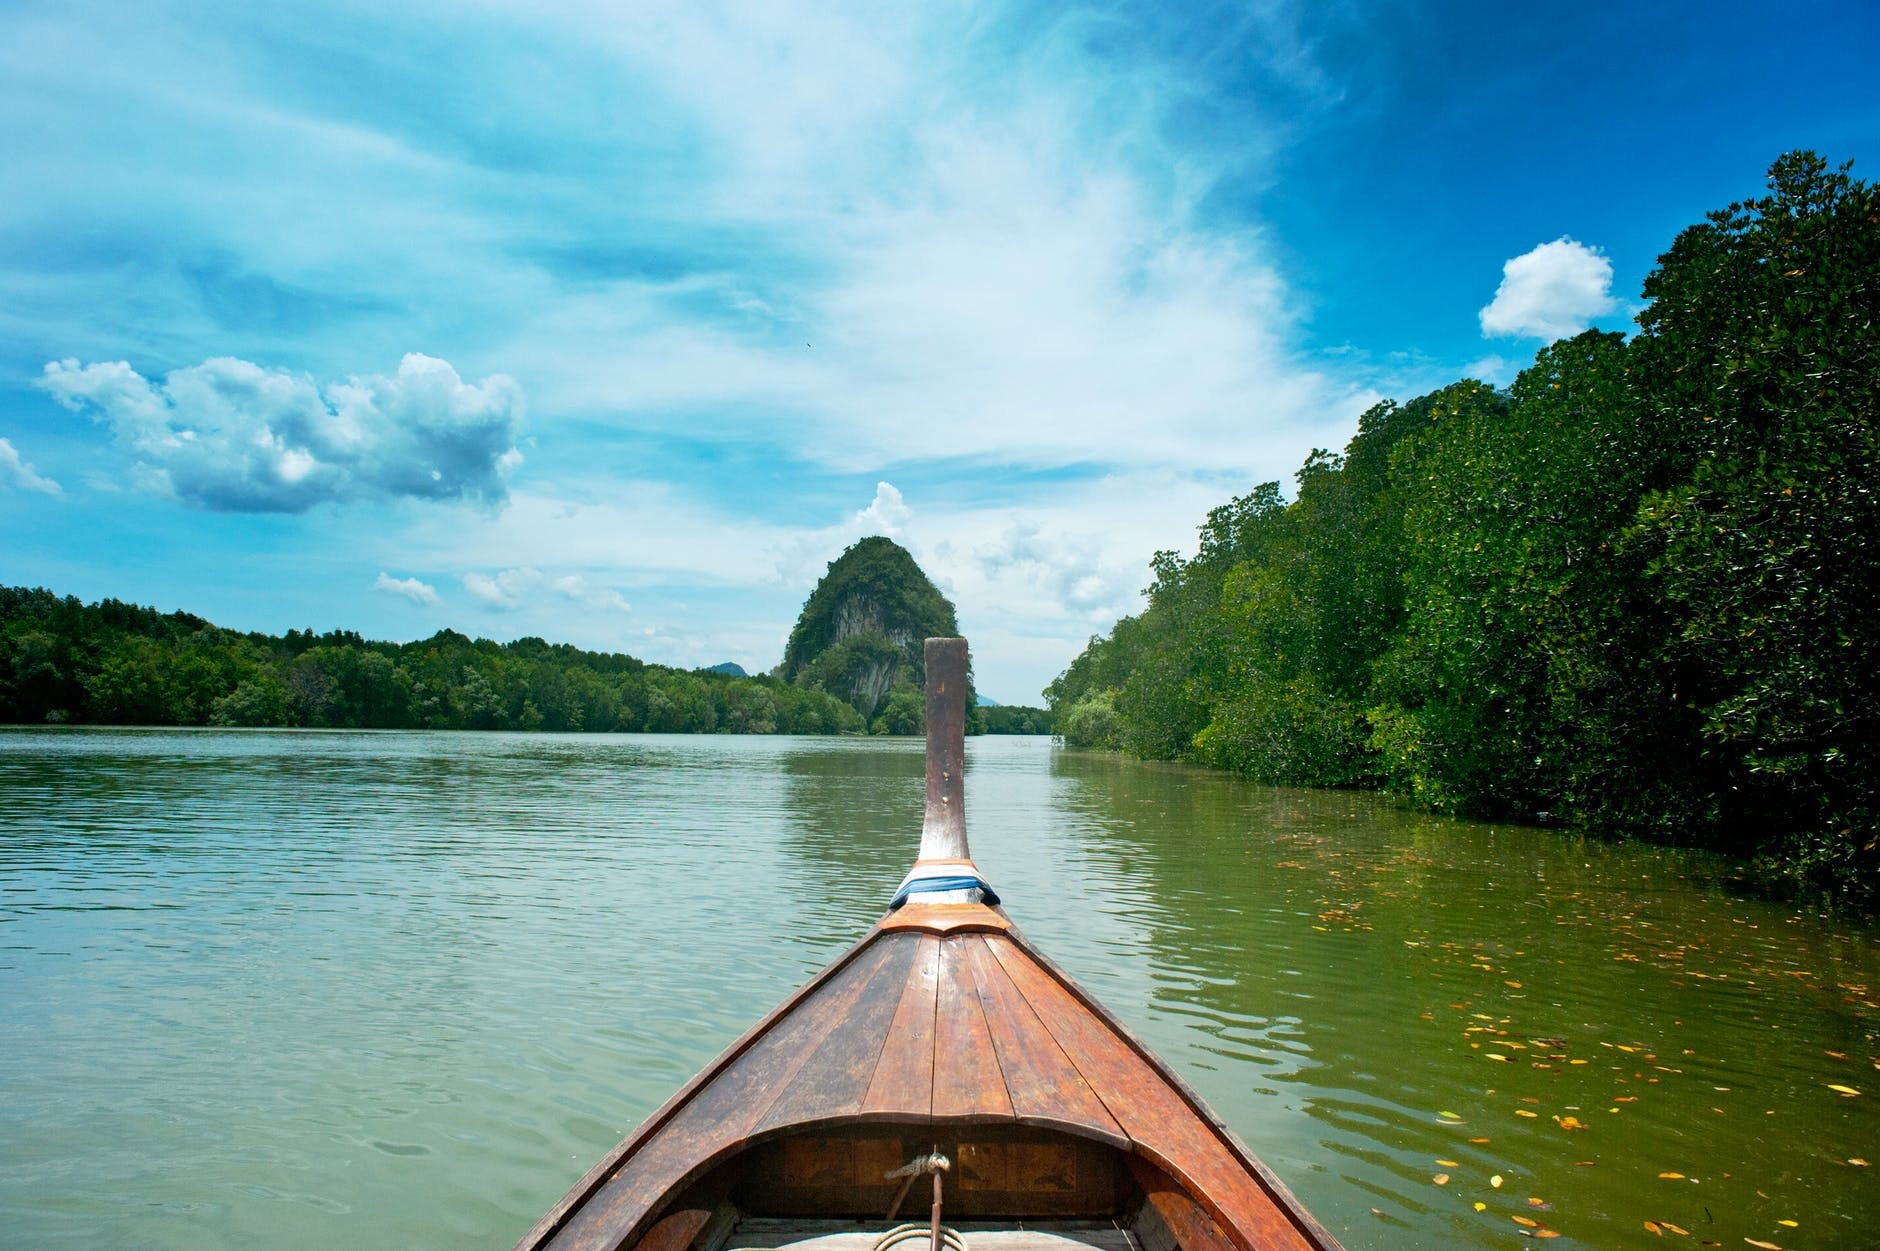 brown wooden canoe near trees